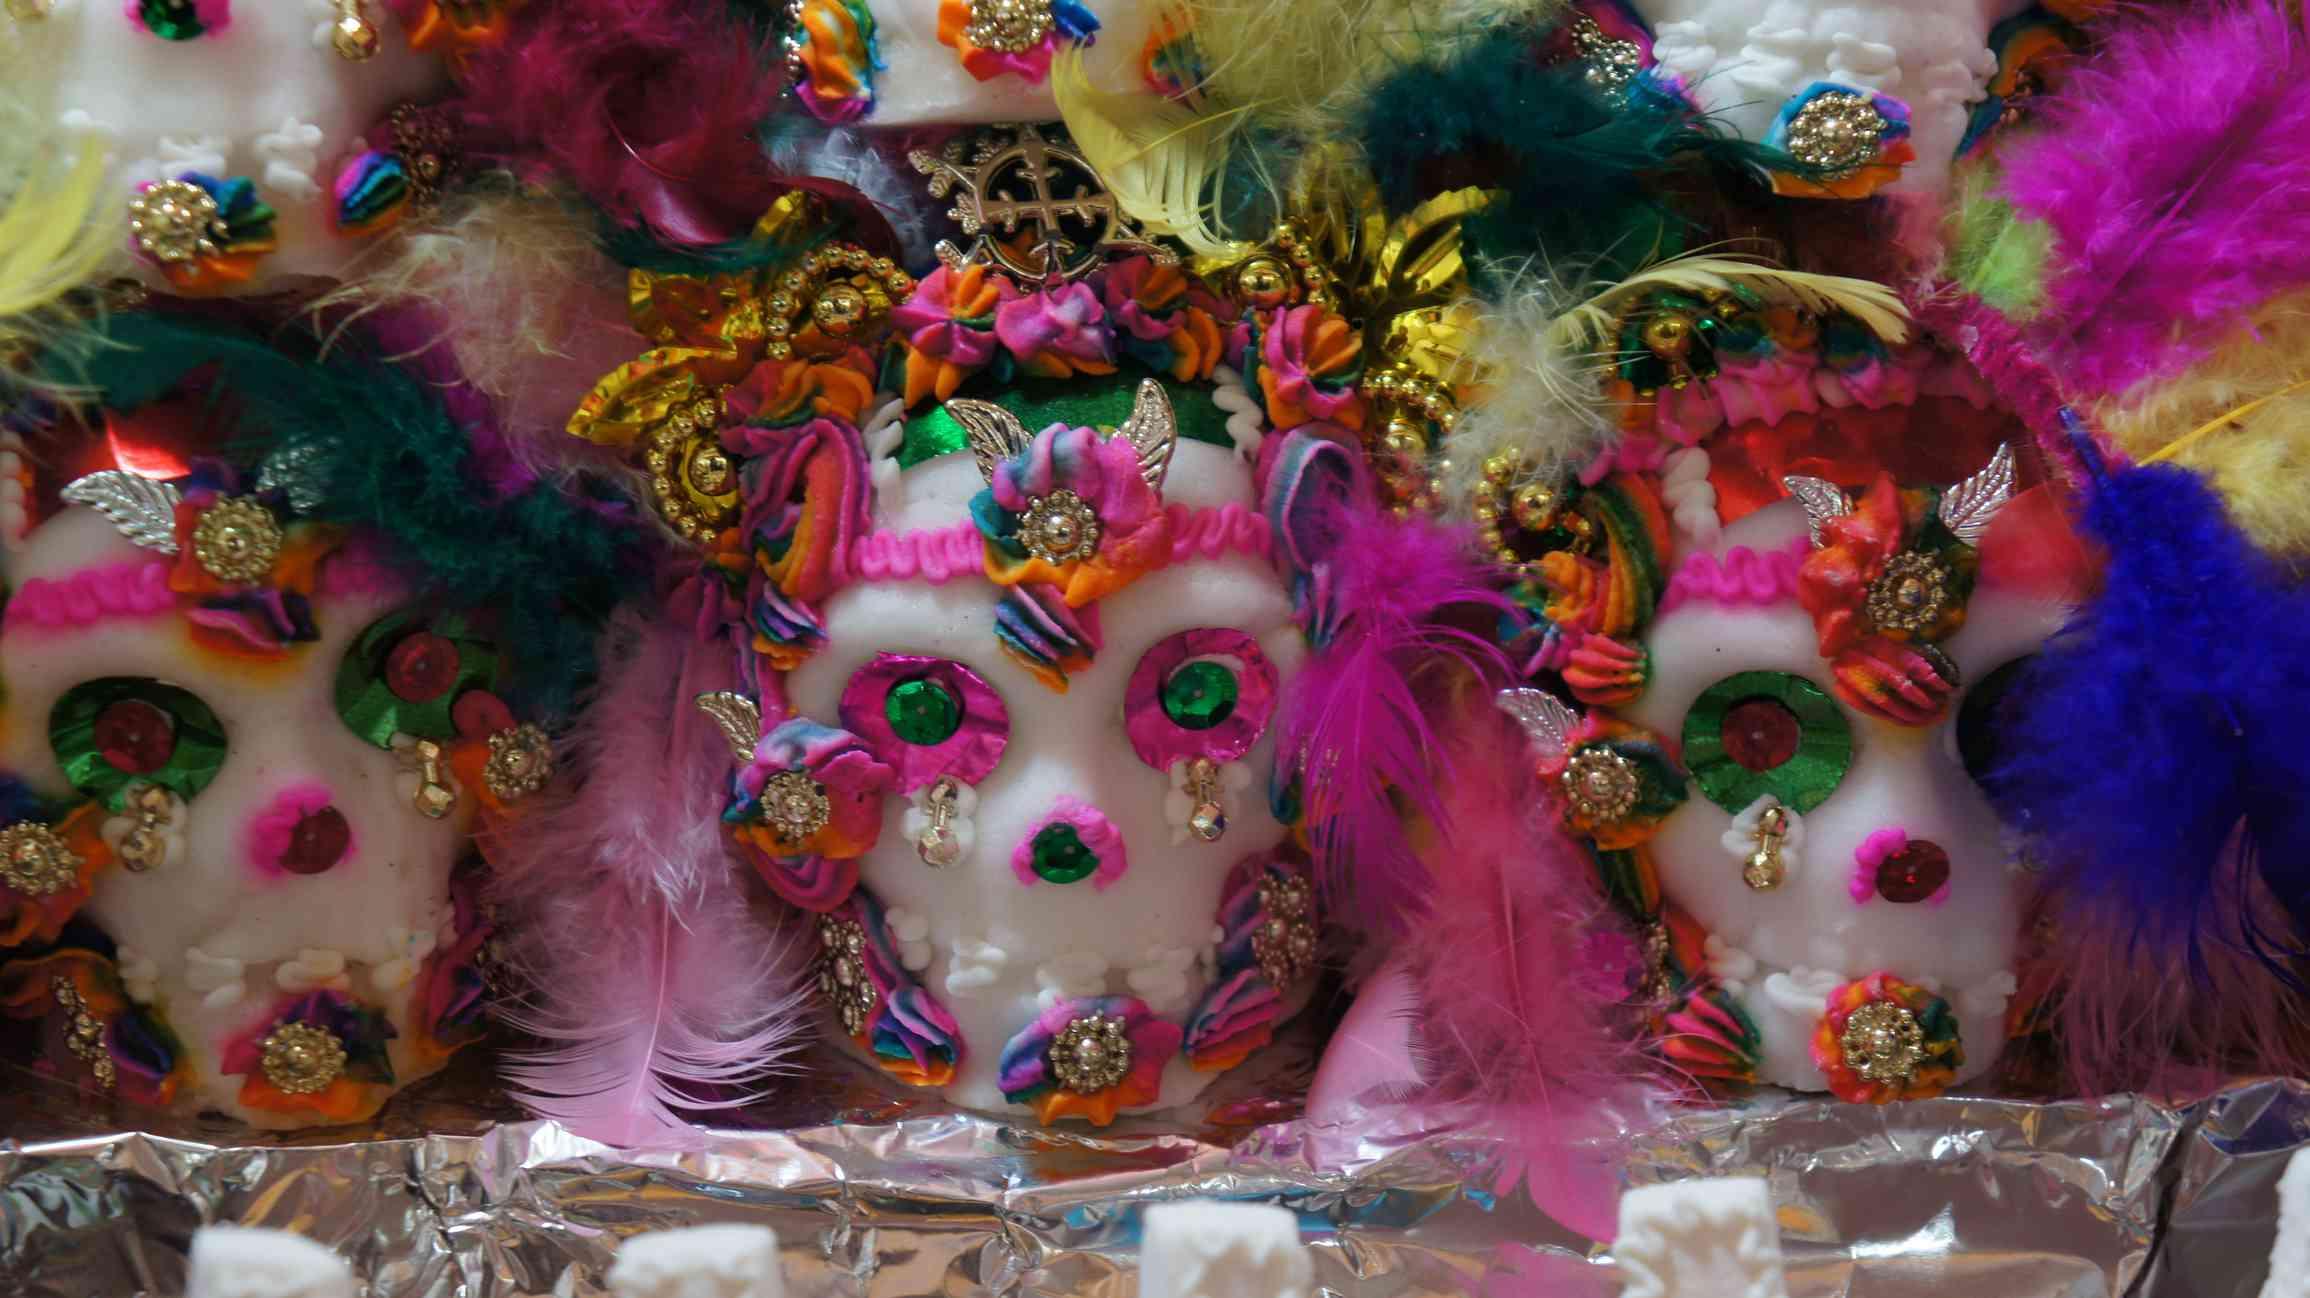 Sugar skulls at the Feria del Alfeñique in Toluca, Mexico